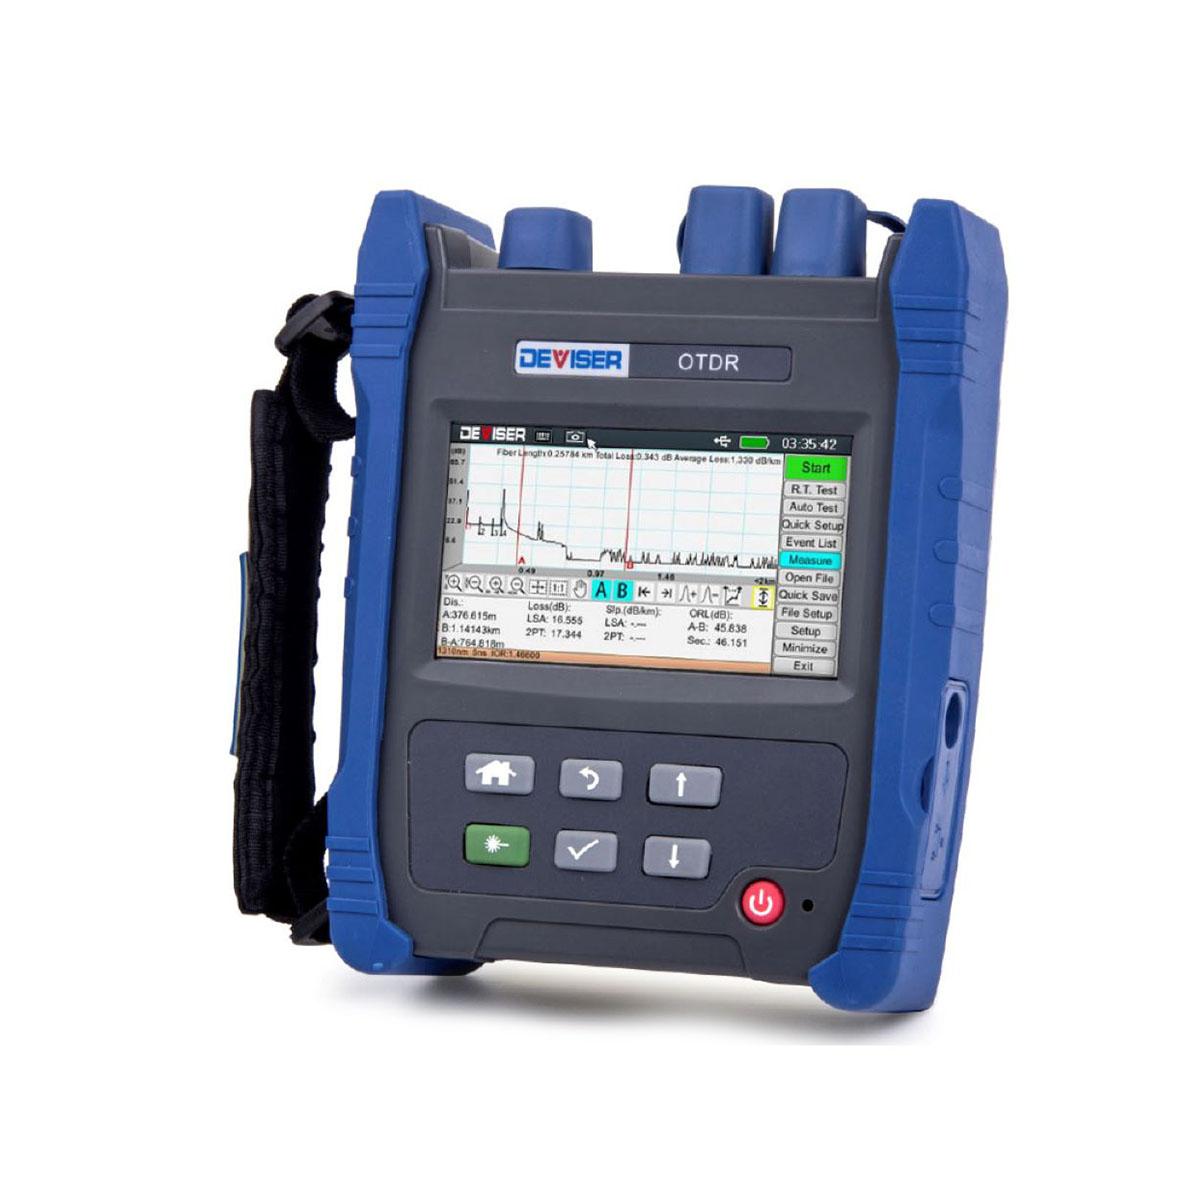 OTDR FTTx RFoG DEVISER AE1001 Localizador de Fallas